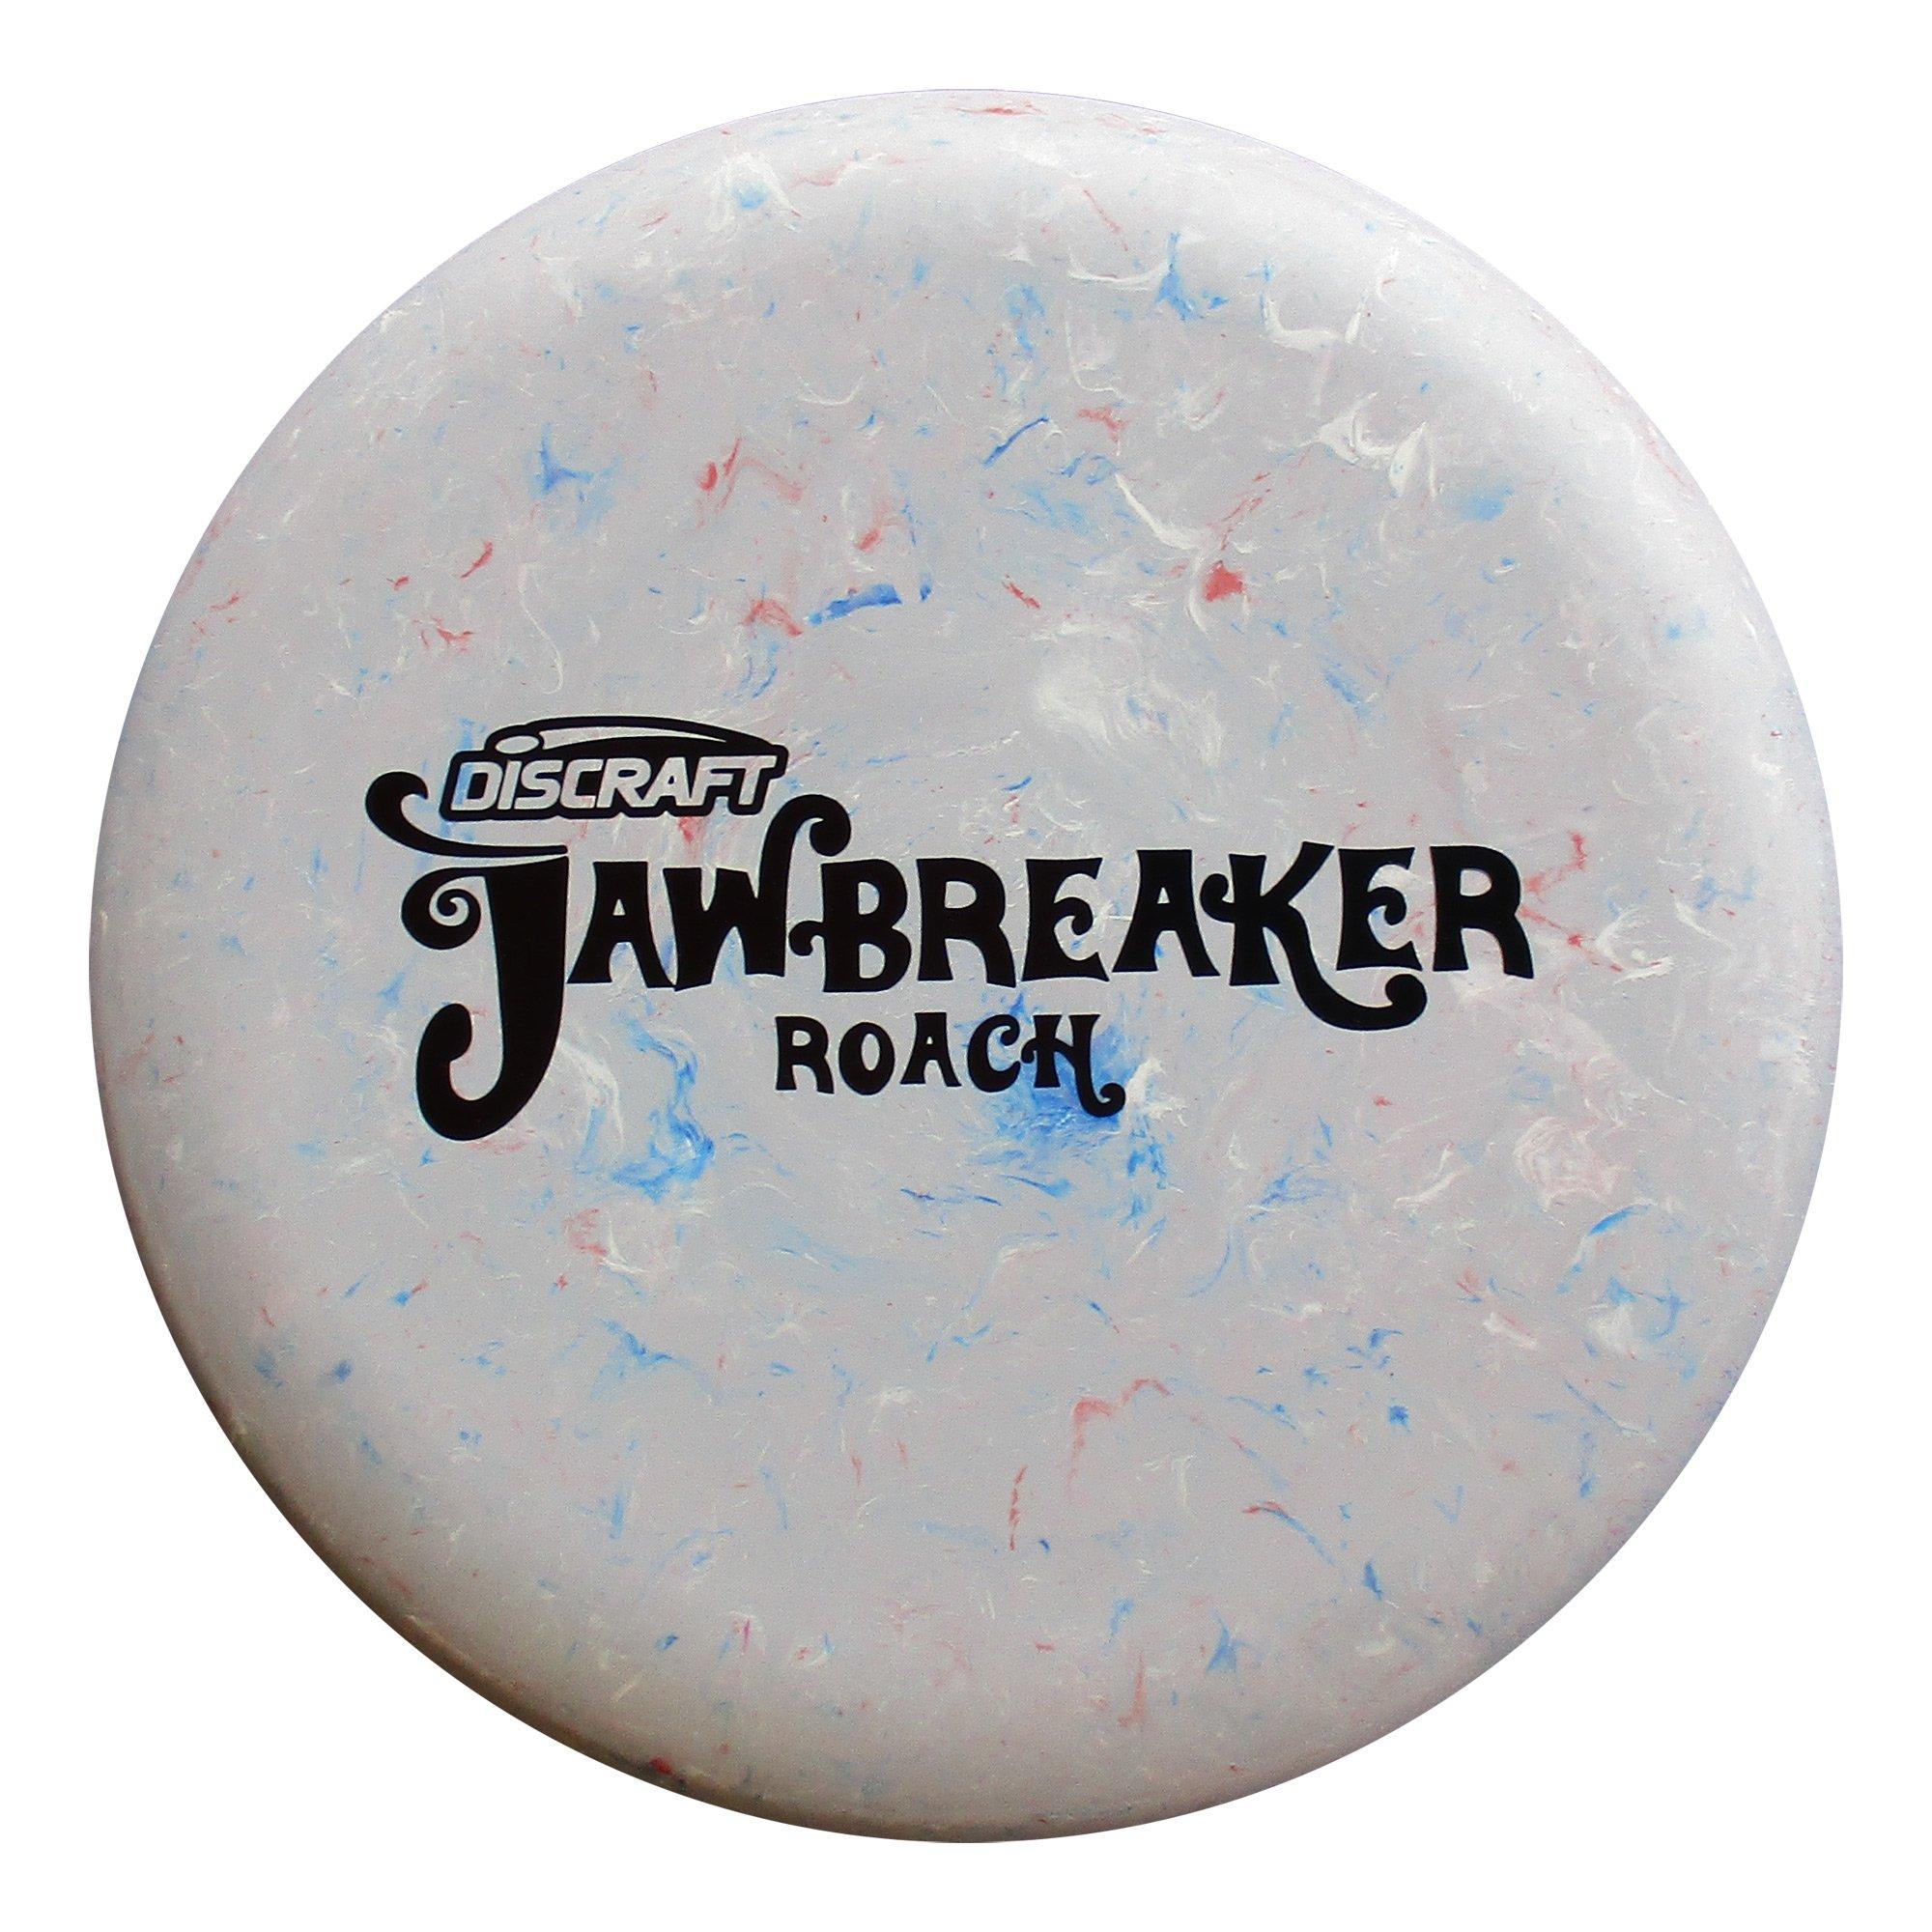 Discraft Jawbreaker Roach Putter 173-174 Golf Disc by Discraft